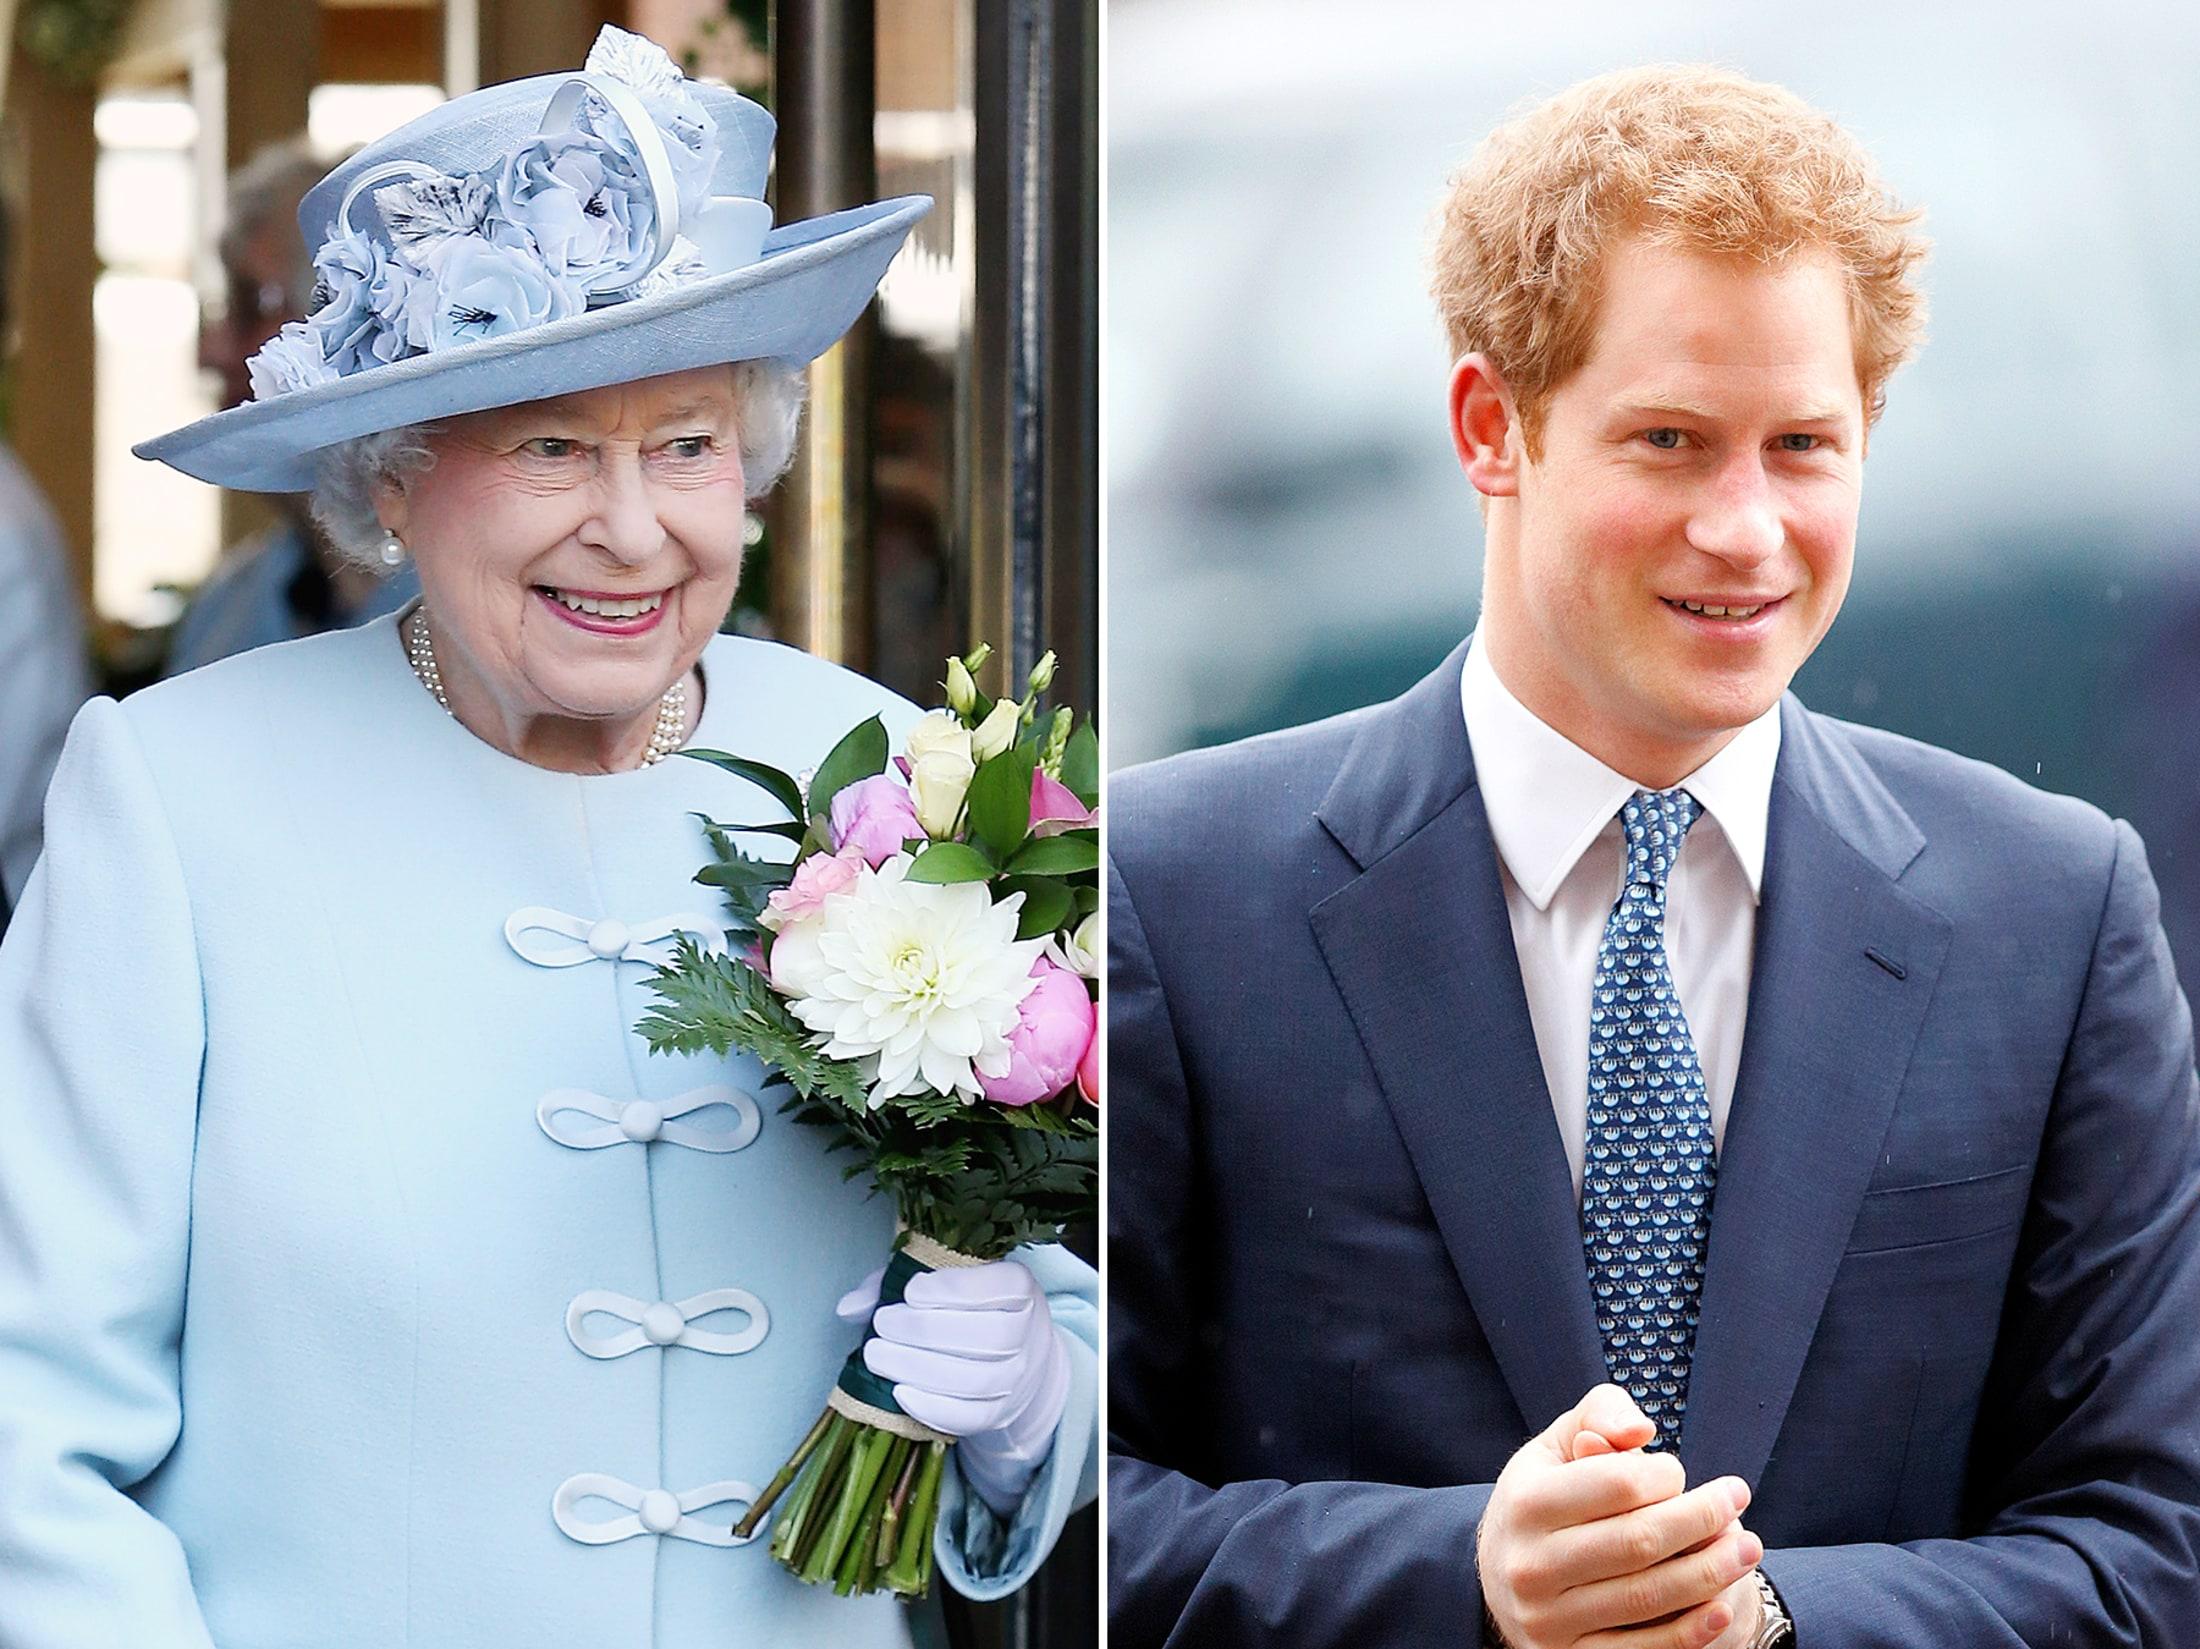 Принц Гарри созрел для женитьбы на артистке Меган Маркл